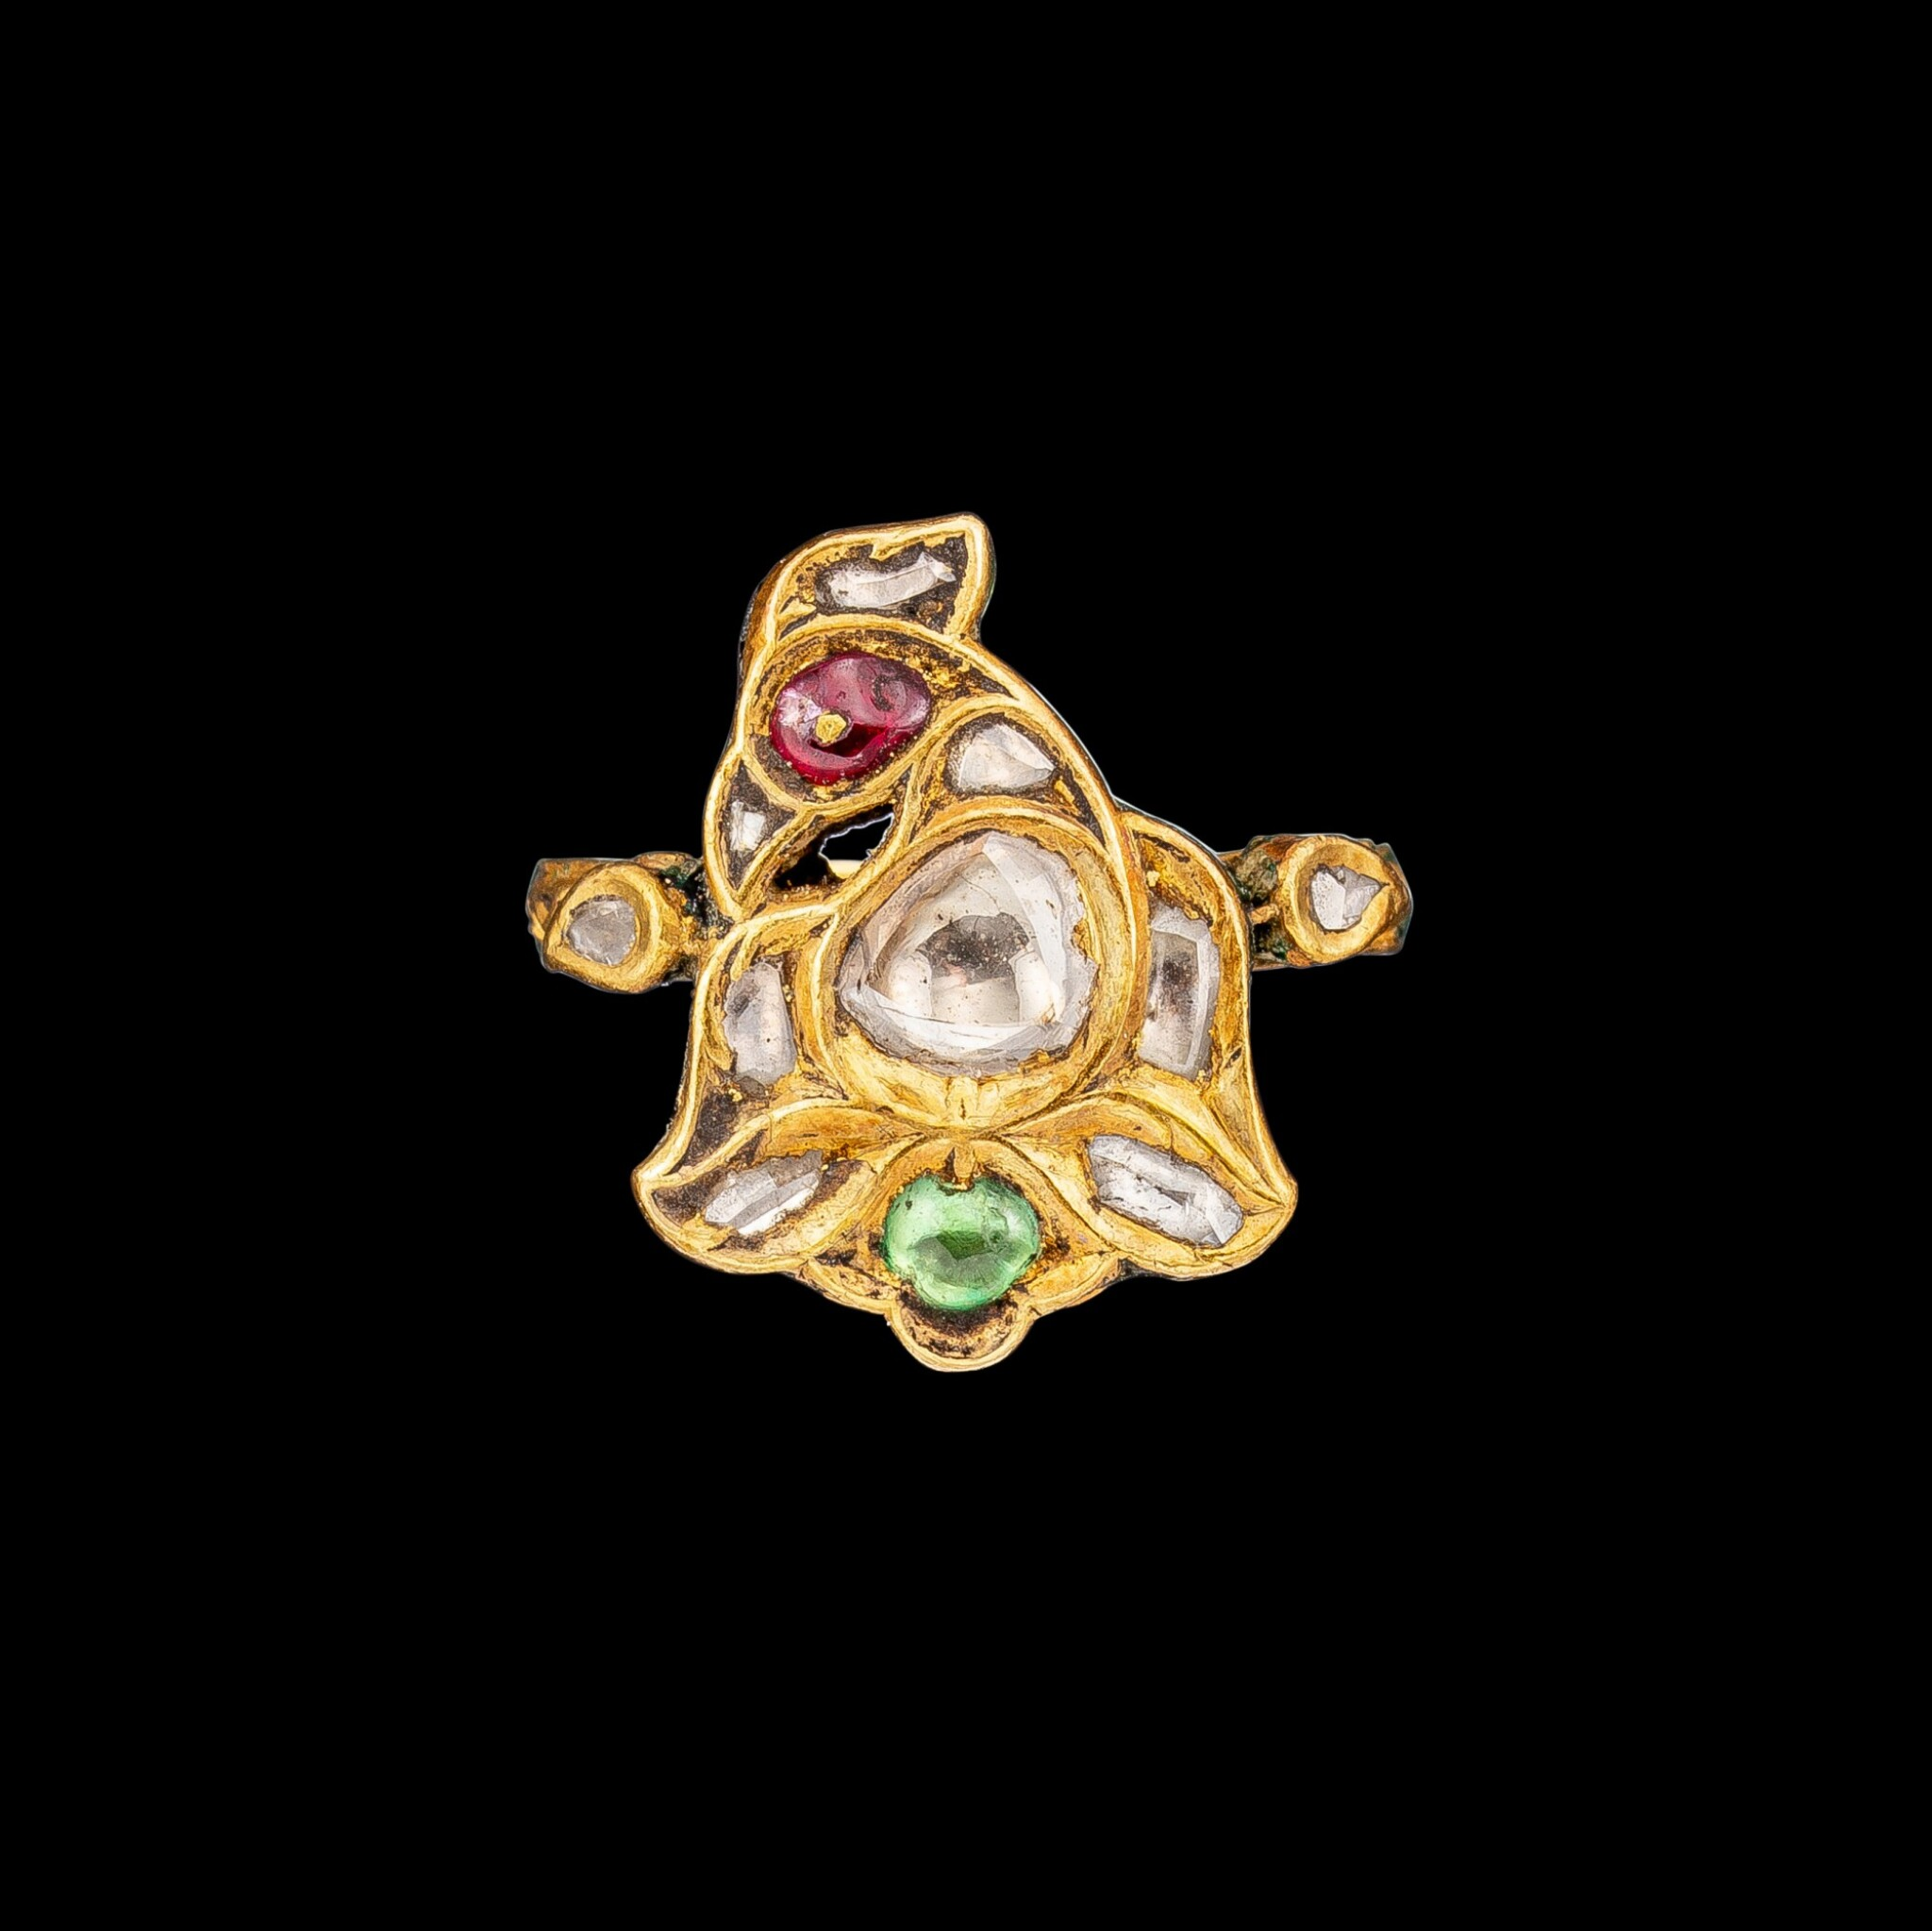 View full screen - View 1 of Lot 1019. A rare gold, diamond, ruby and emerald 'bird' ring Jaipur, North India, 19th century   十九世紀 北印度齋浦爾 金嵌鑽石、紅寶及祖母綠鳥形戒指 背飾琺瑯彩鳥紋.